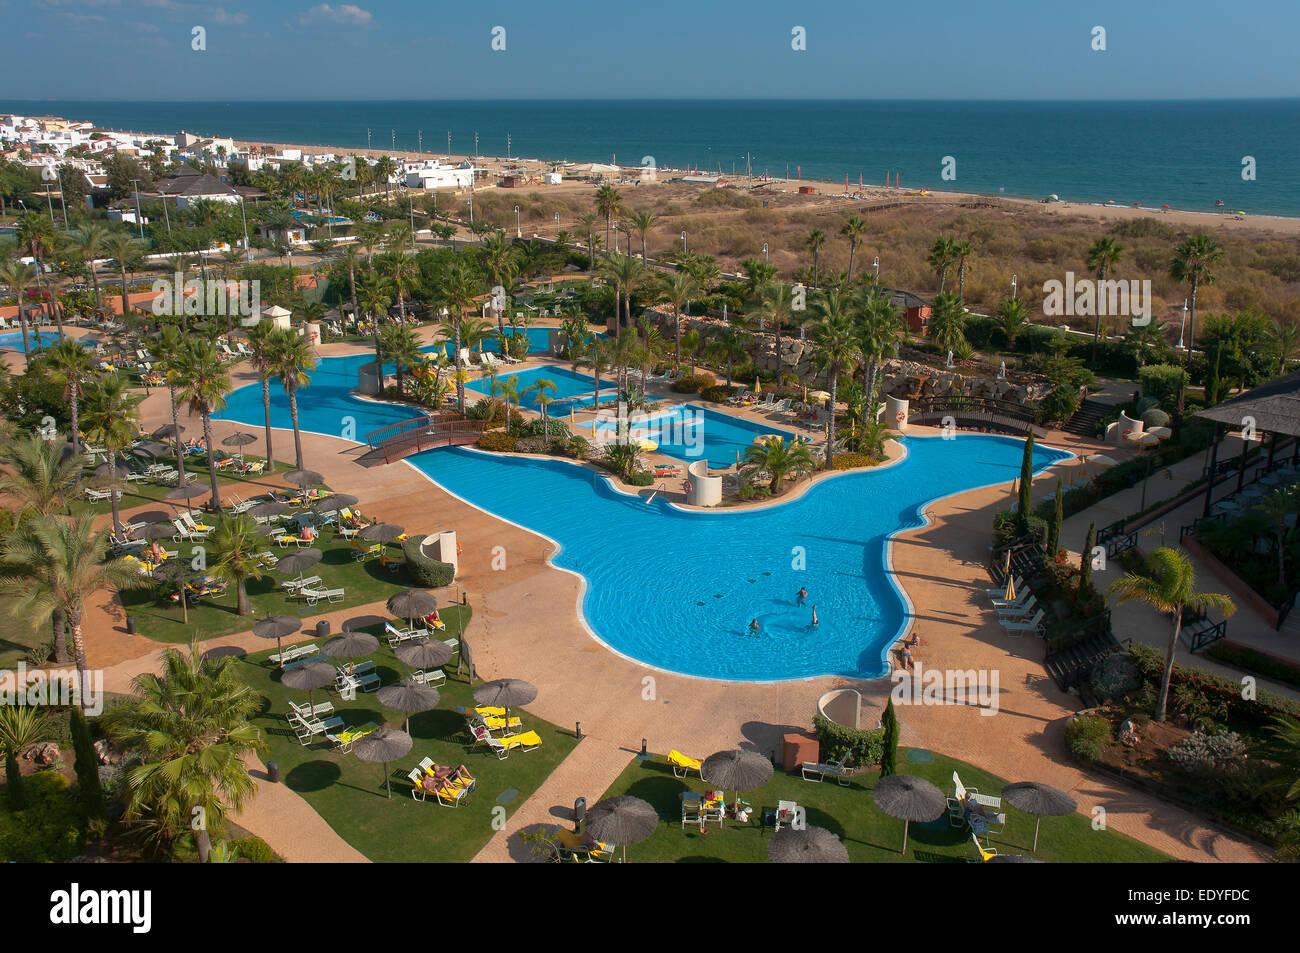 Islantilla beach and puerto antilla grand hotel lepe huelva stock photo royalty free image - Puerto antilla grand hotel ...